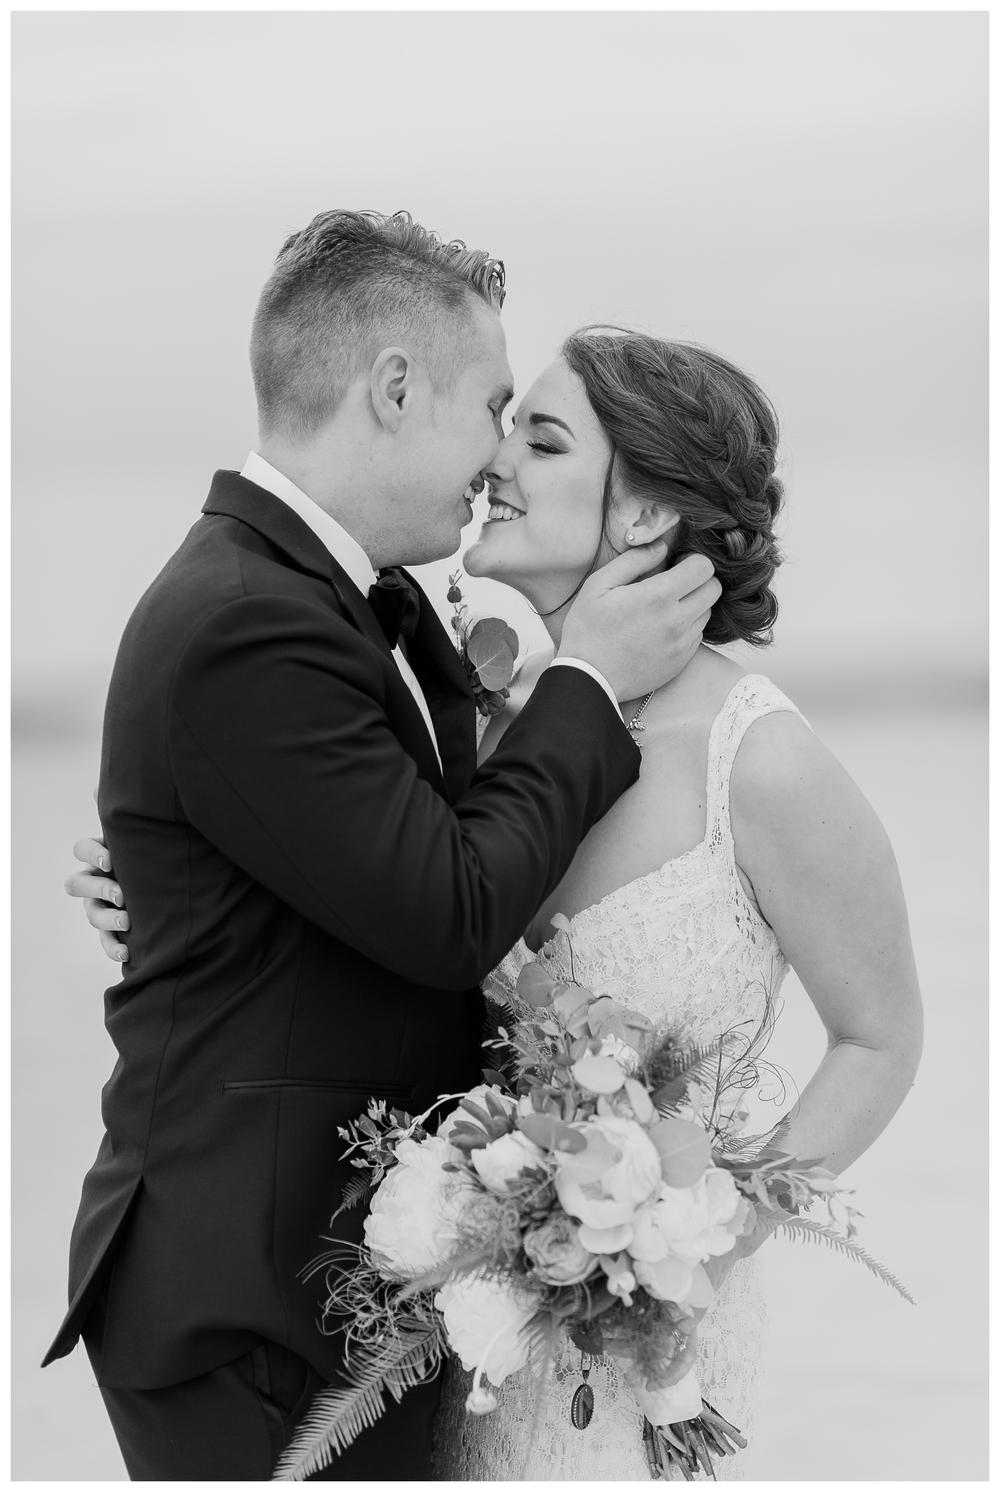 Rebecca_Bridges_Photography_Indianapolis_Wedding_Photographer_4415.jpg